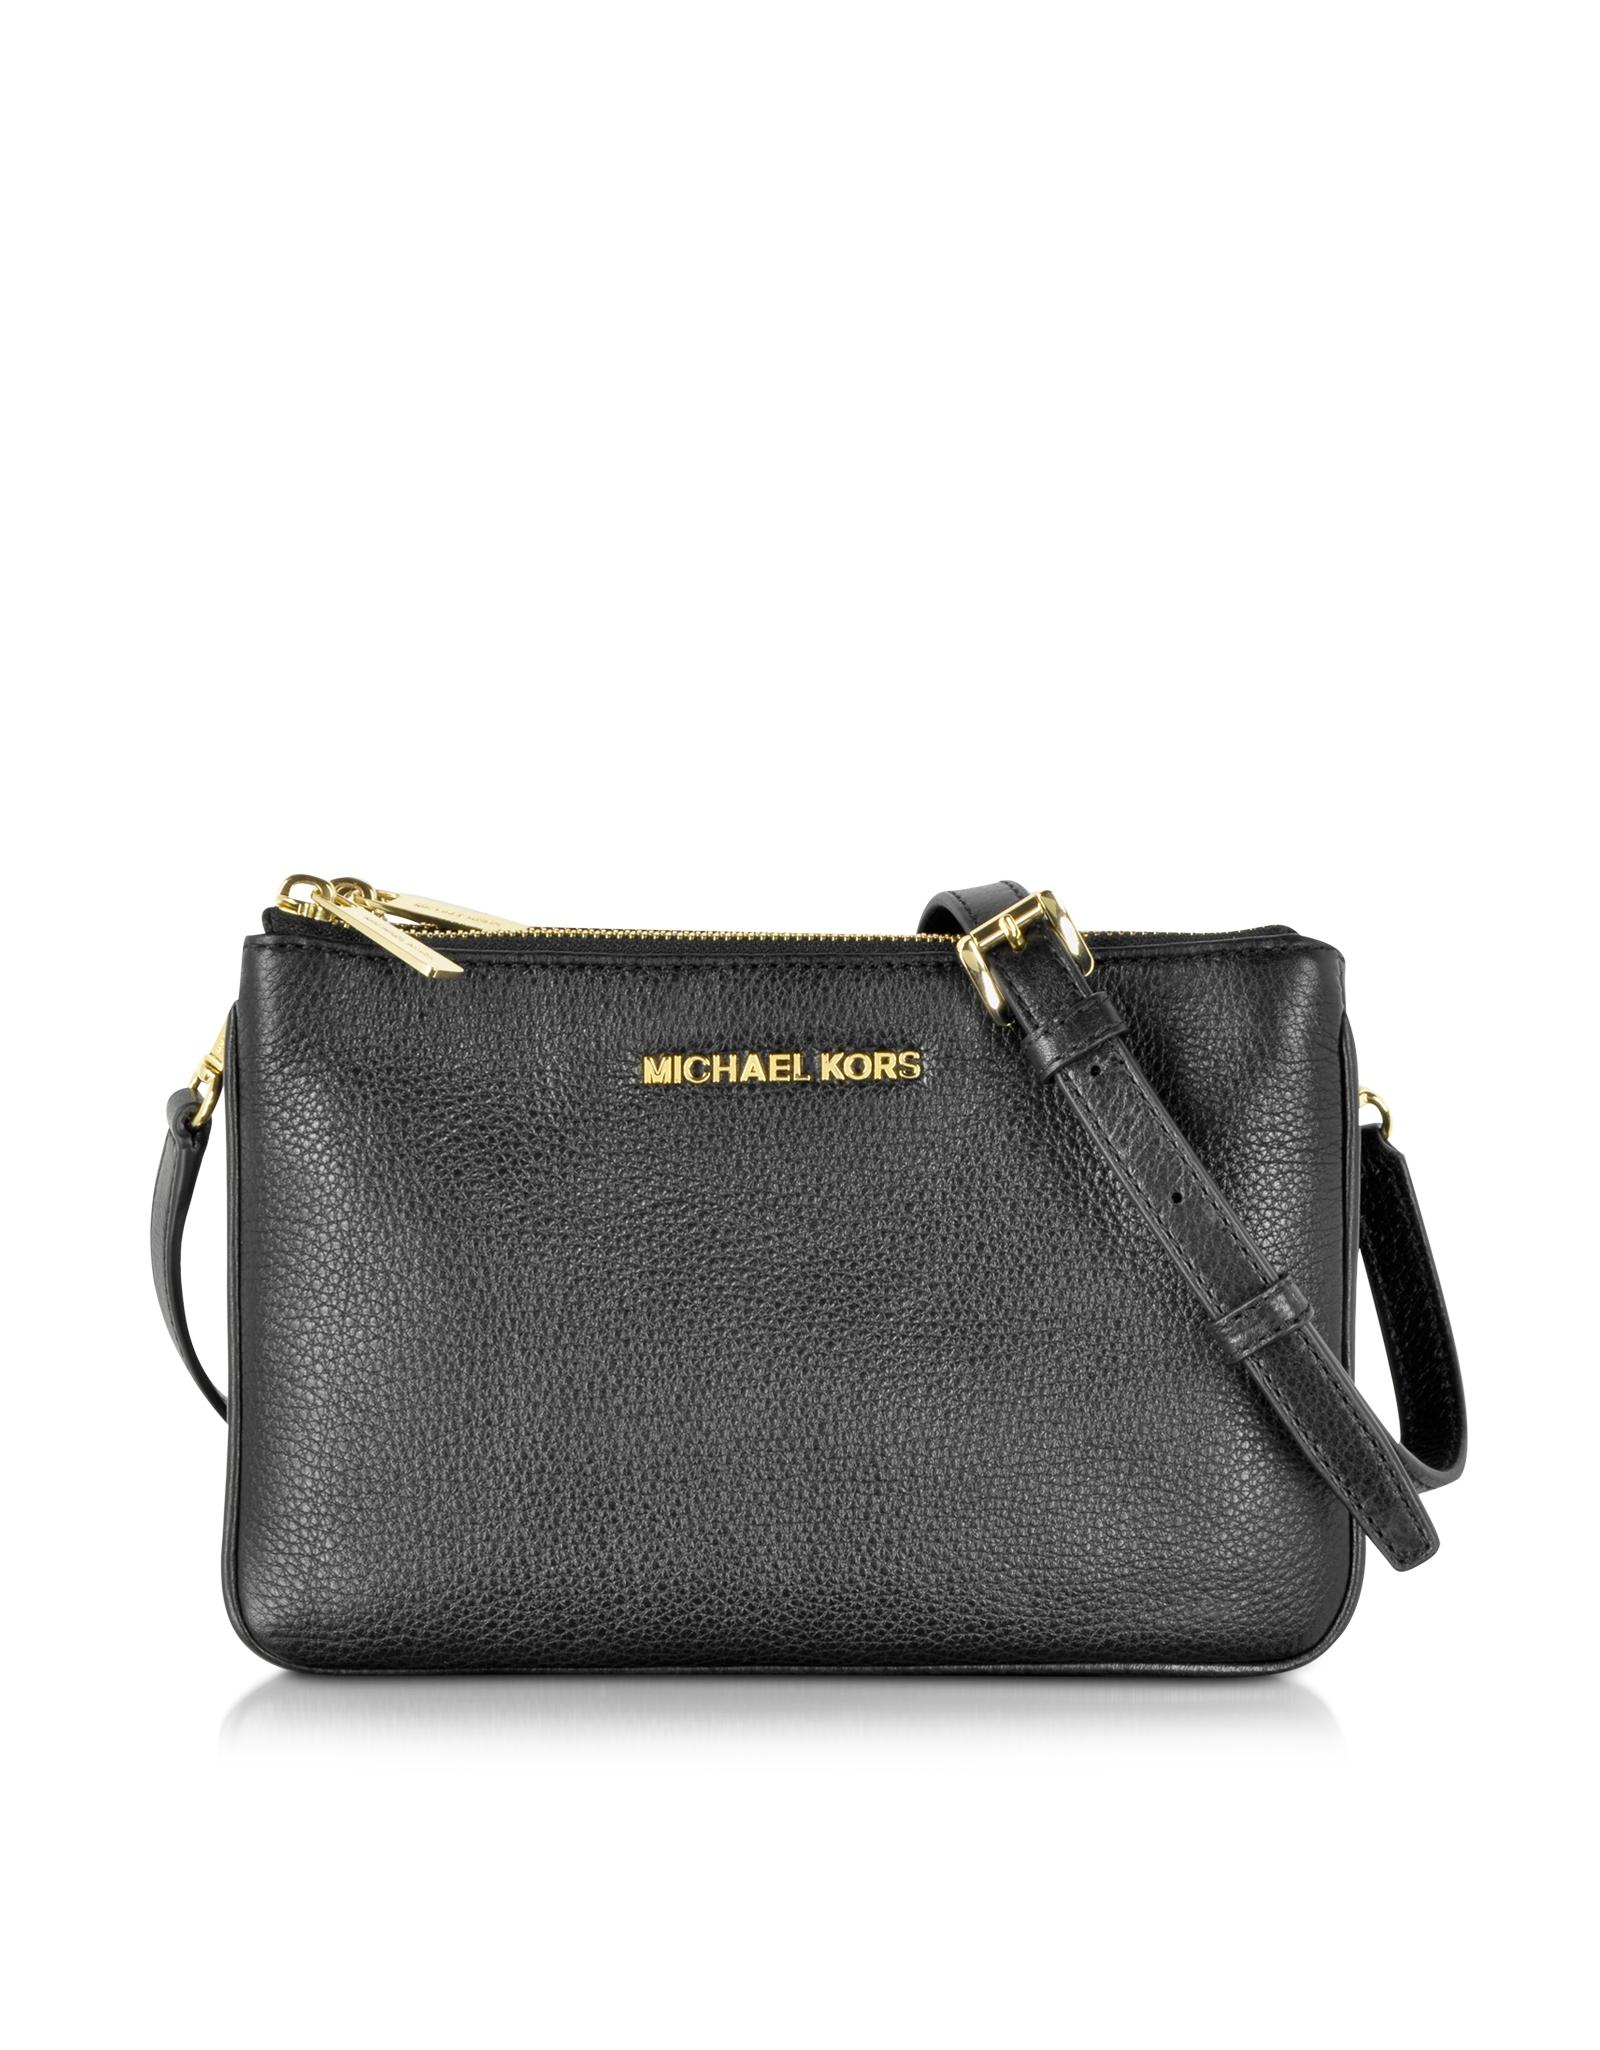 michael kors bedford black leather gusset crossbody bag in